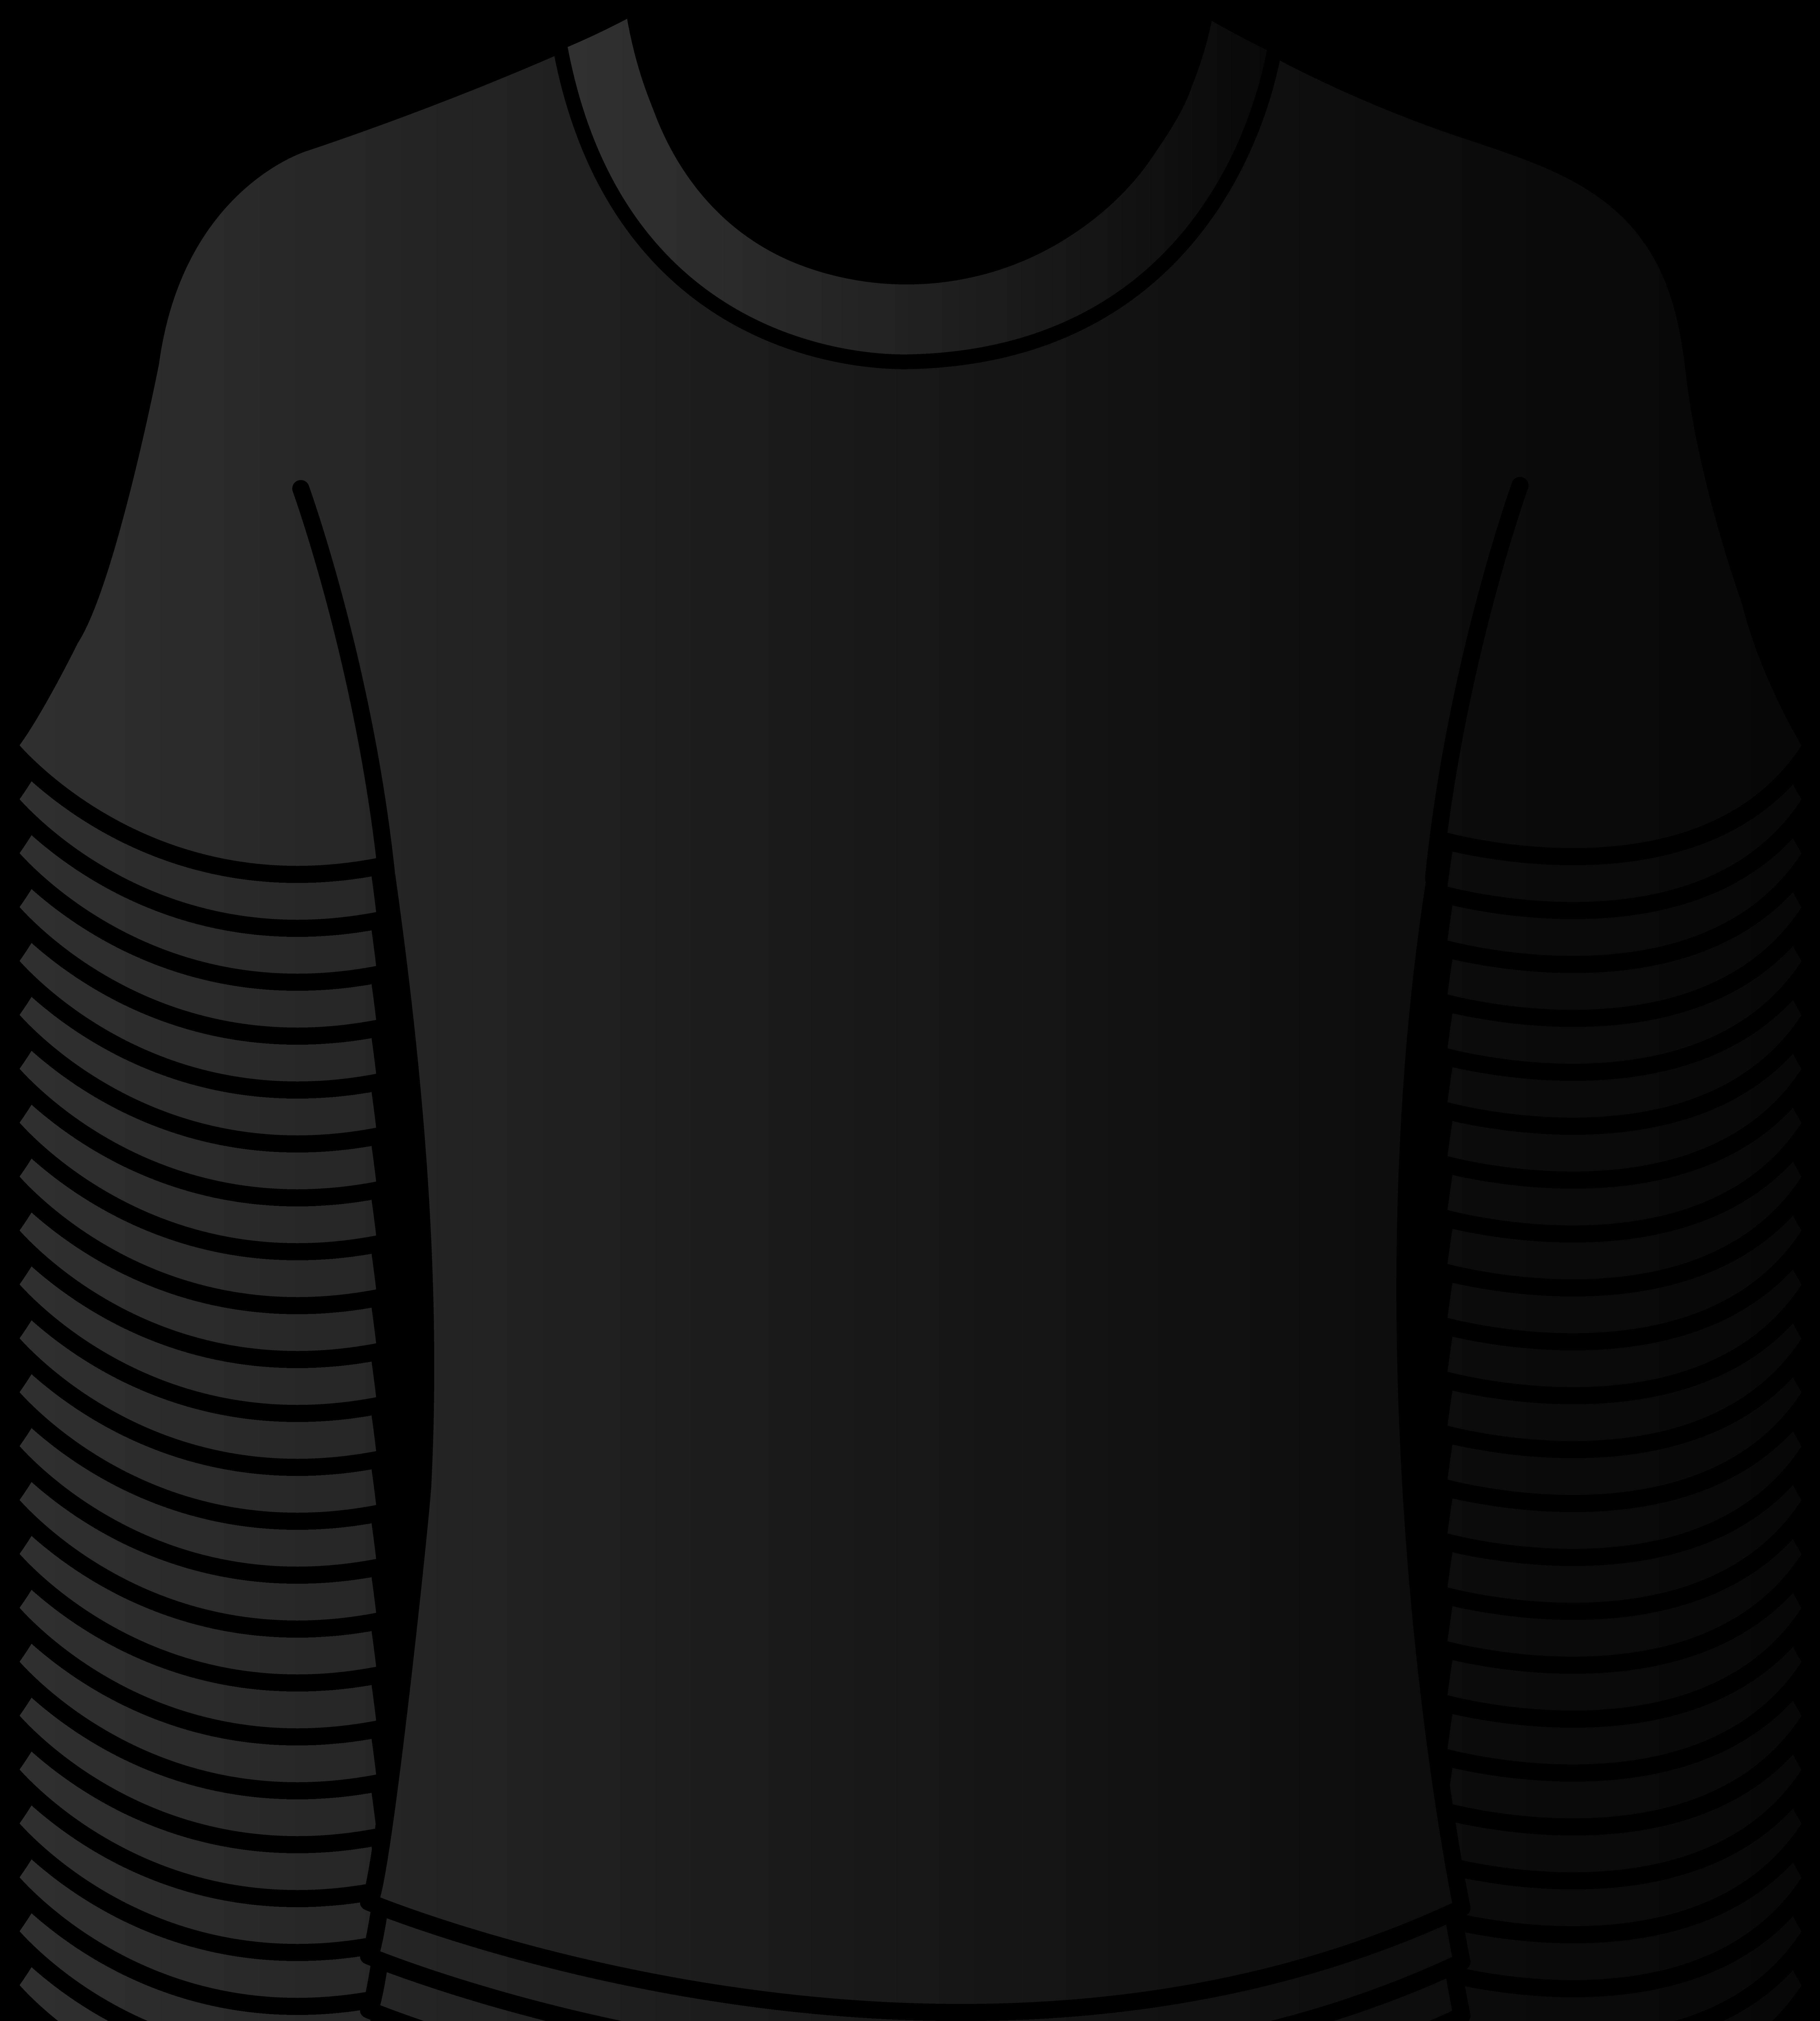 Iron clipart wrinkled shirt, Iron wrinkled shirt Transparent.